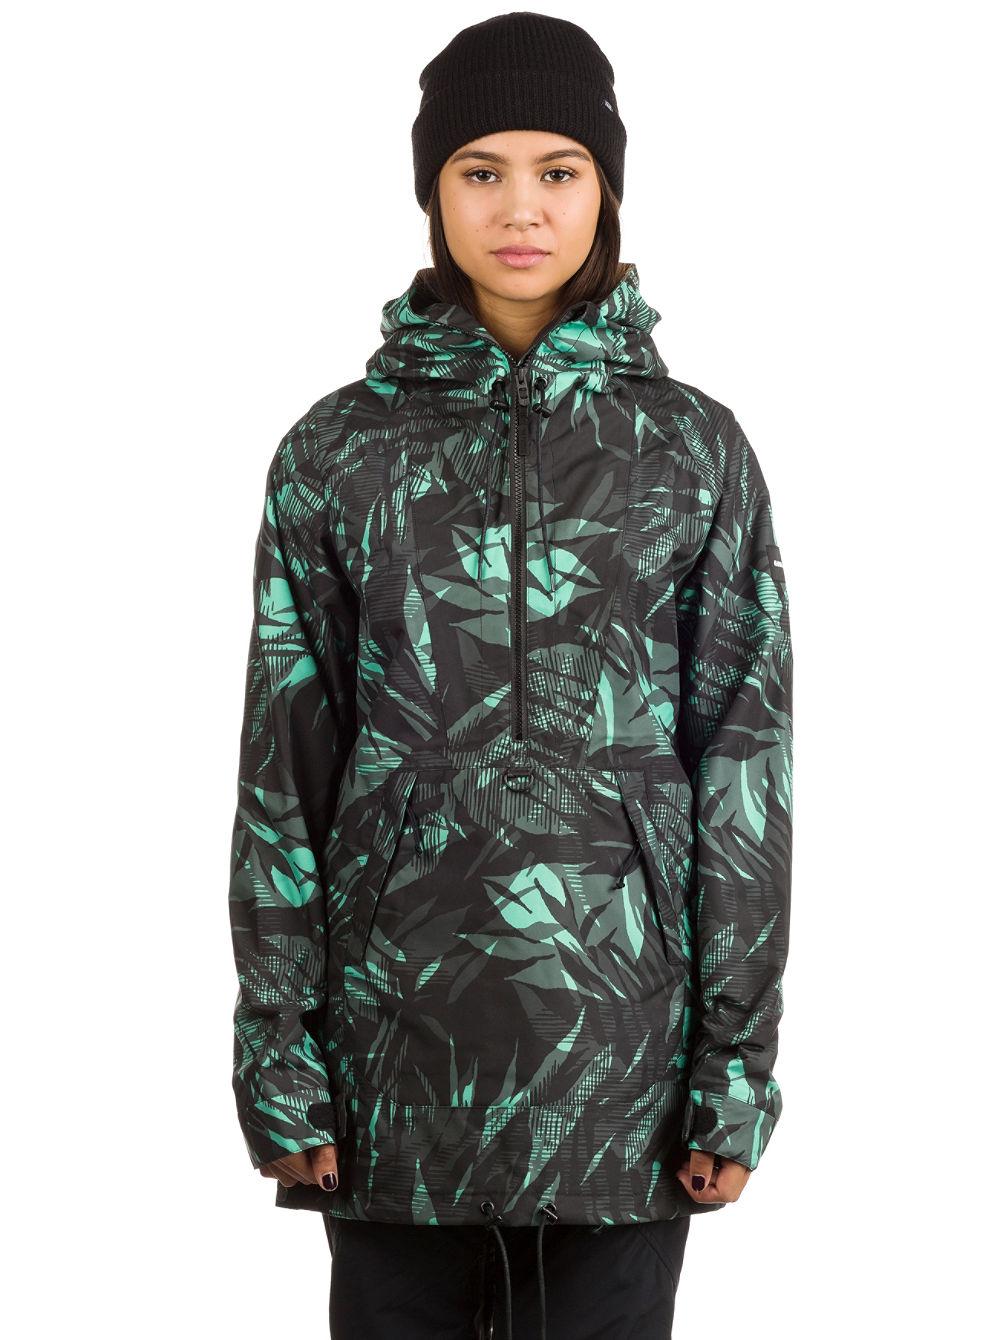 8d0152330 Saint Pullover Anorak Jacket